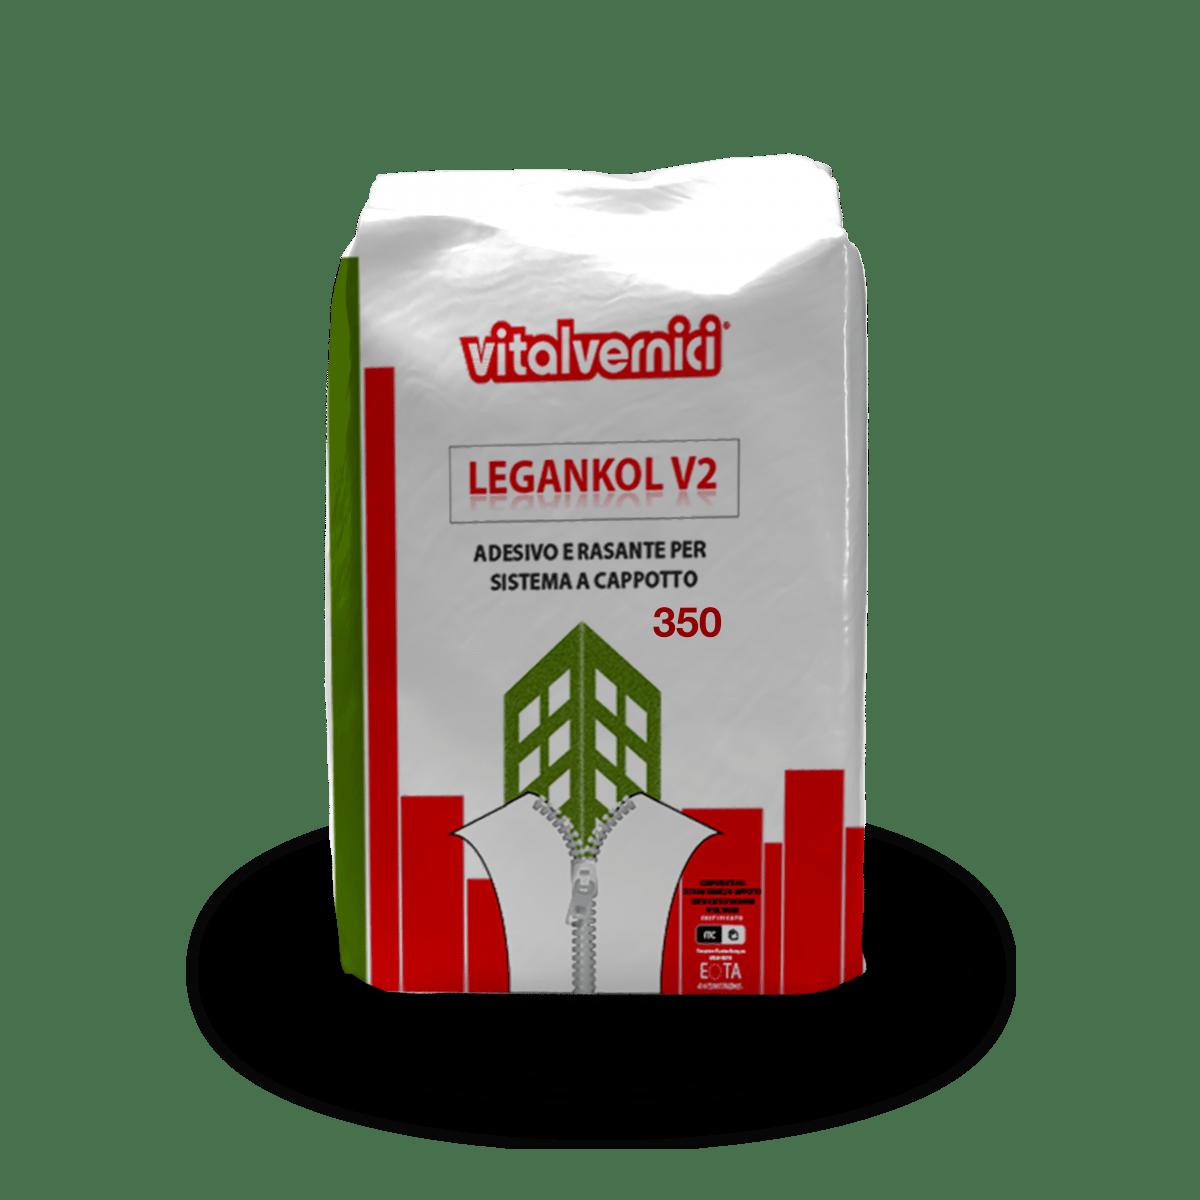 Adesivo e rasante a base di cemento